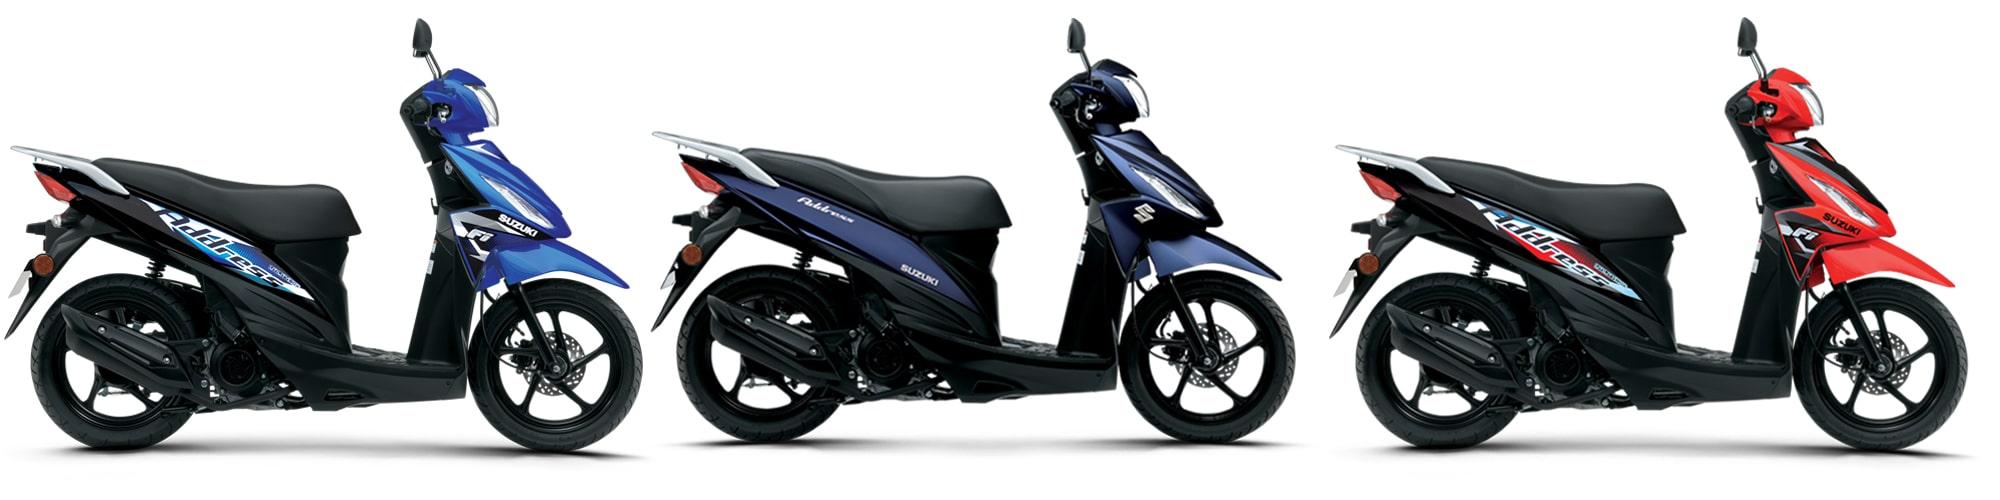 New Suzuki Address